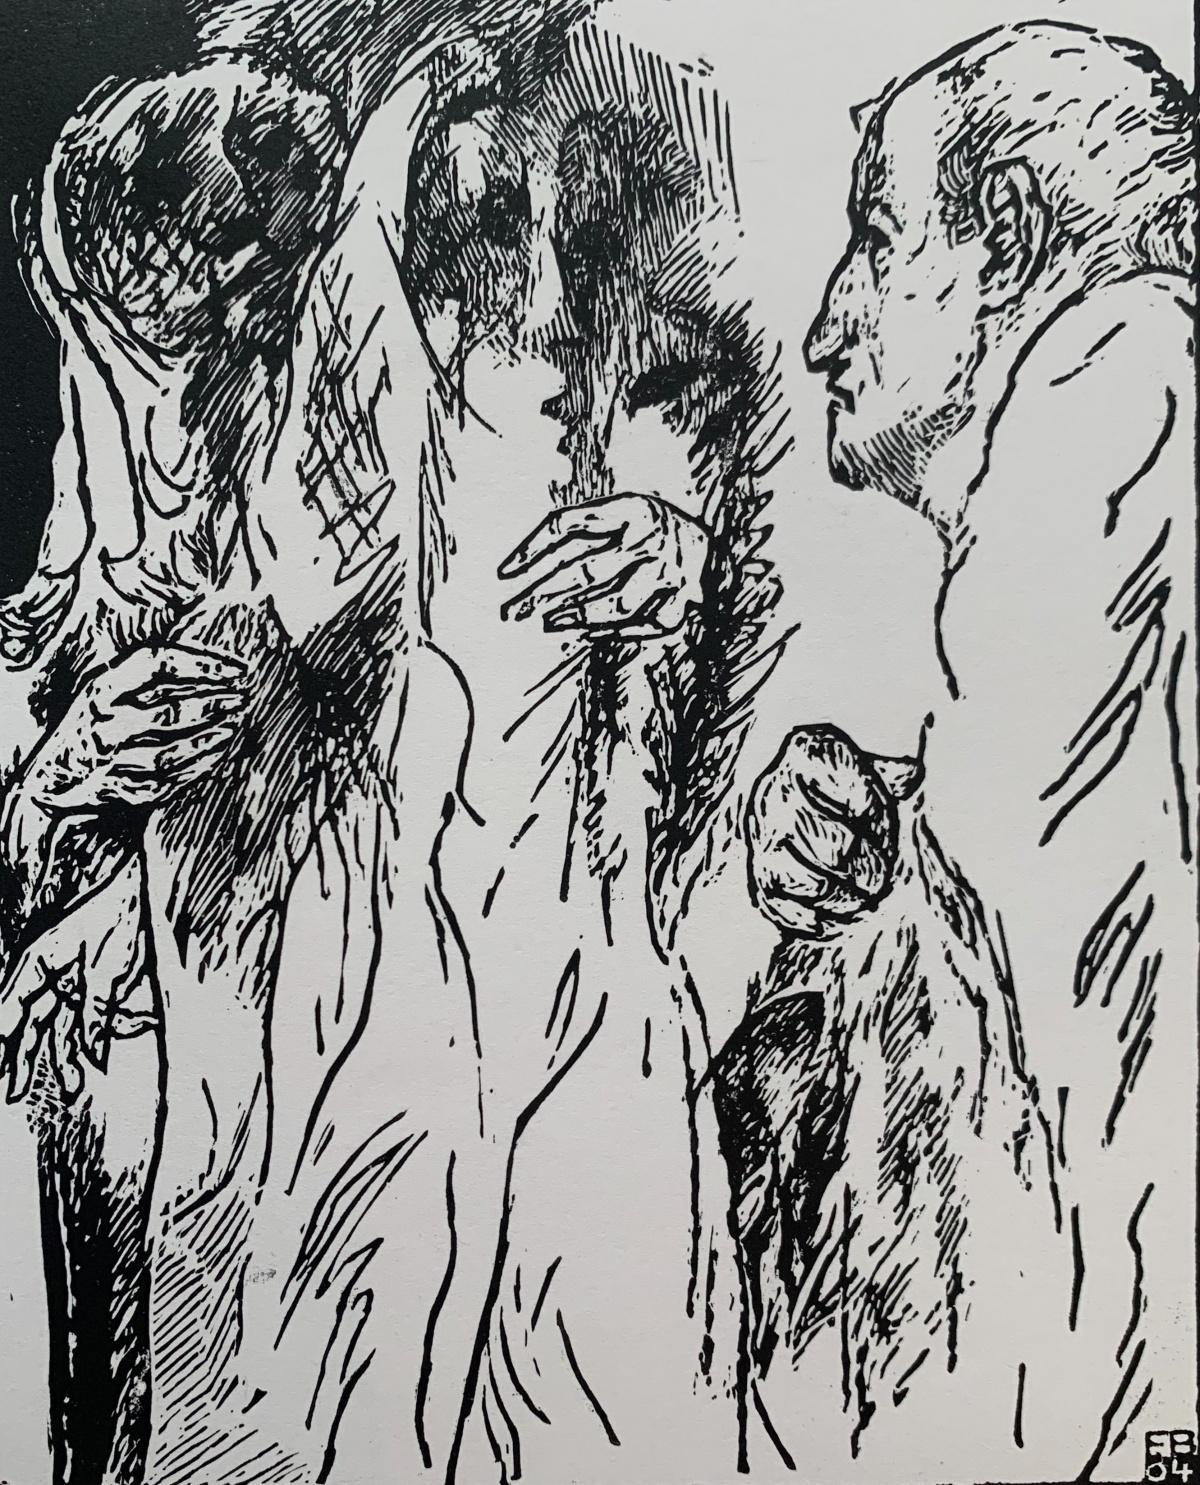 A conversation - Black and white linocut, Figurative